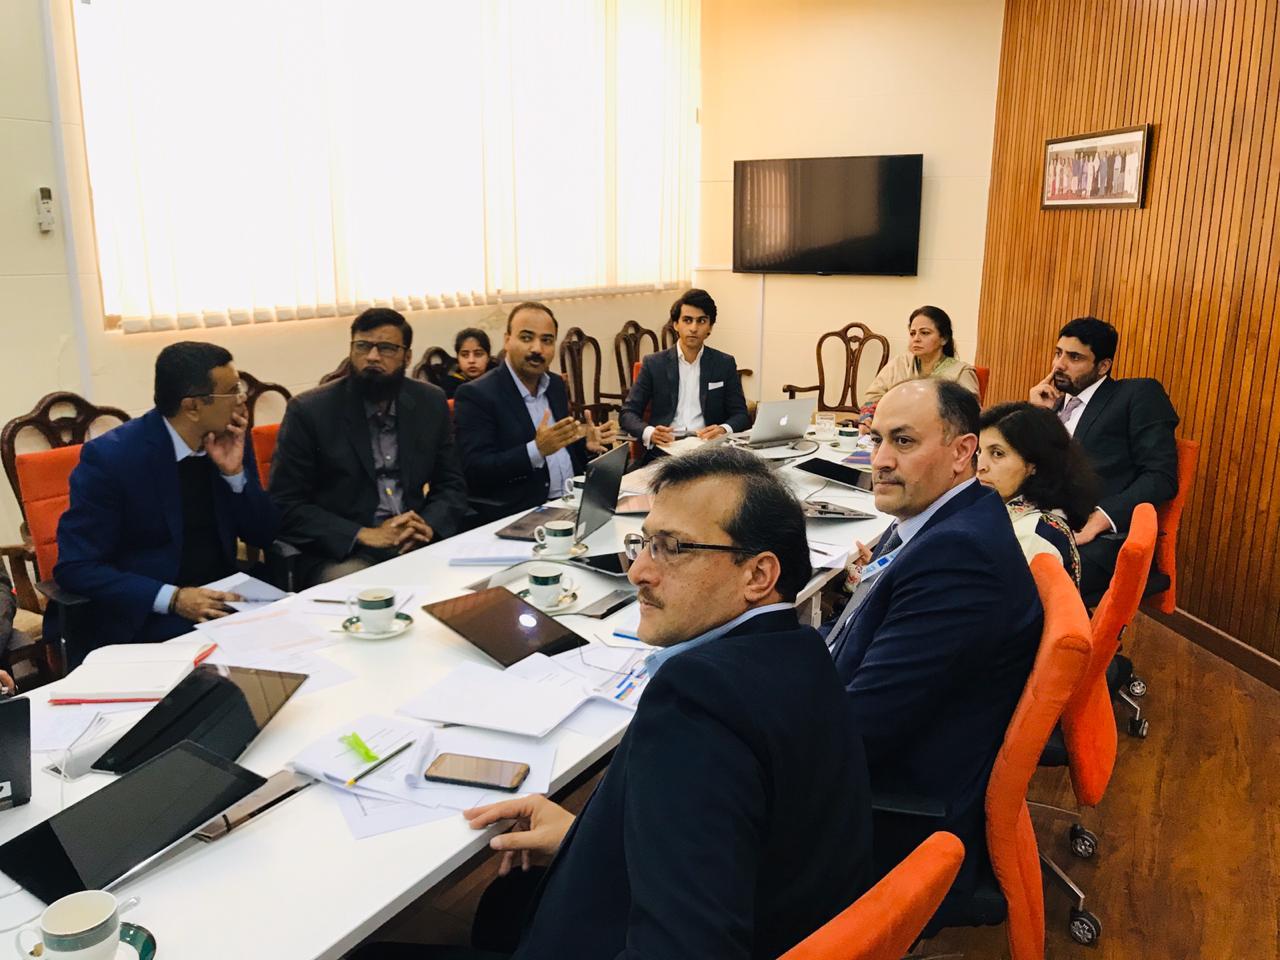 Meeting of the Sub-Group on SDGs Scorecards